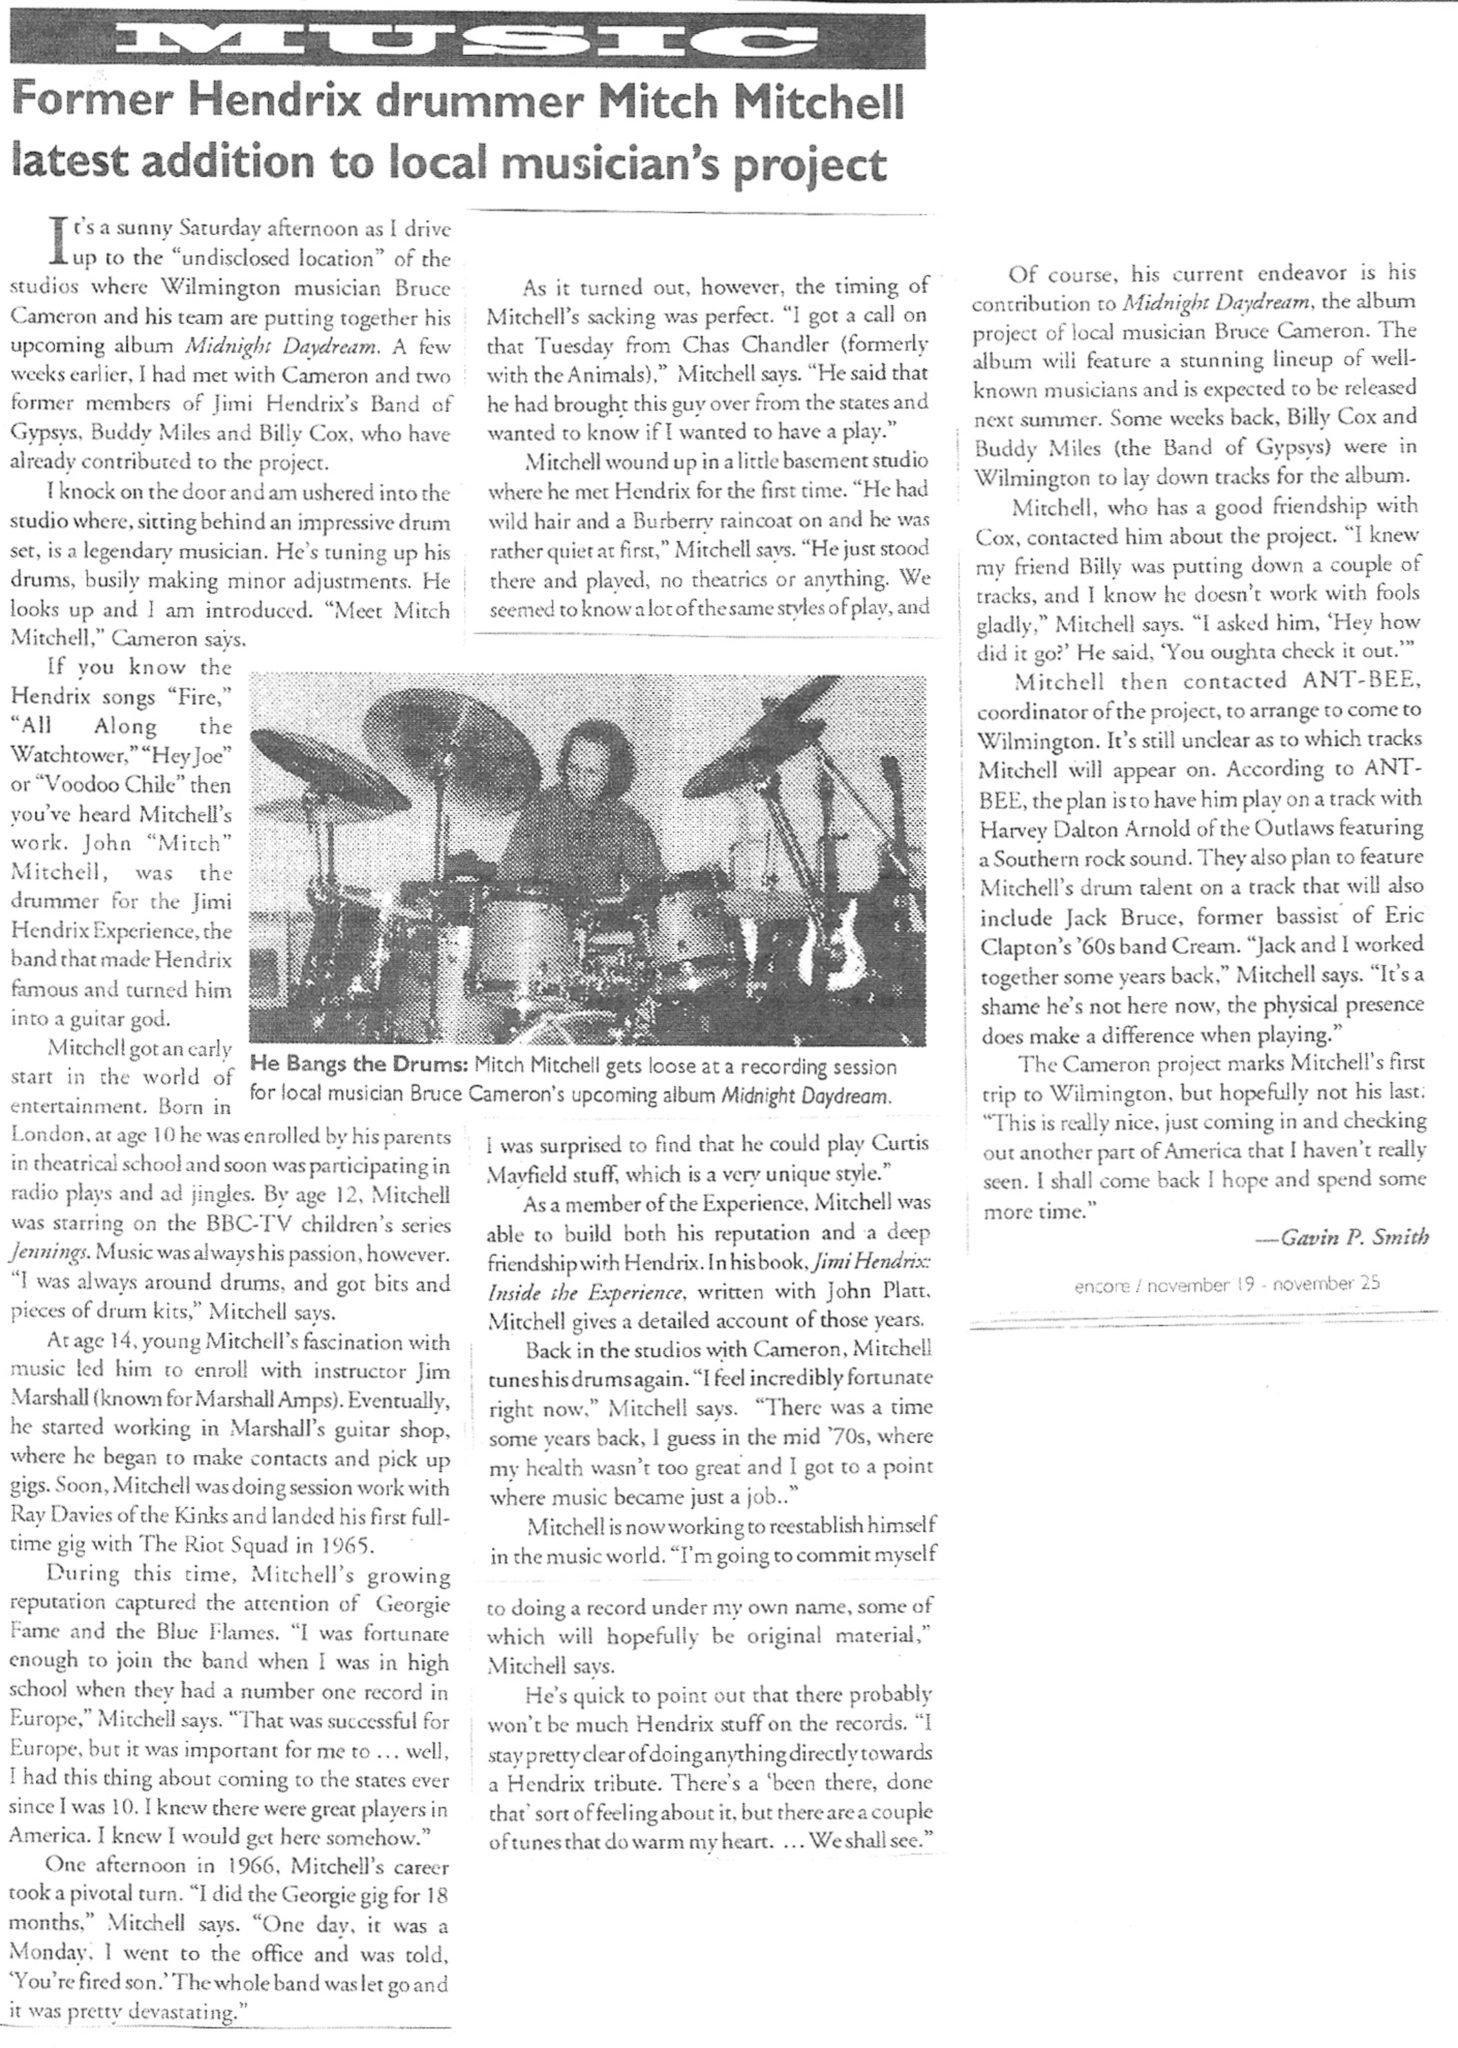 Gavin P Smith - Encore Magazine 1999 - Mitch Mitchell